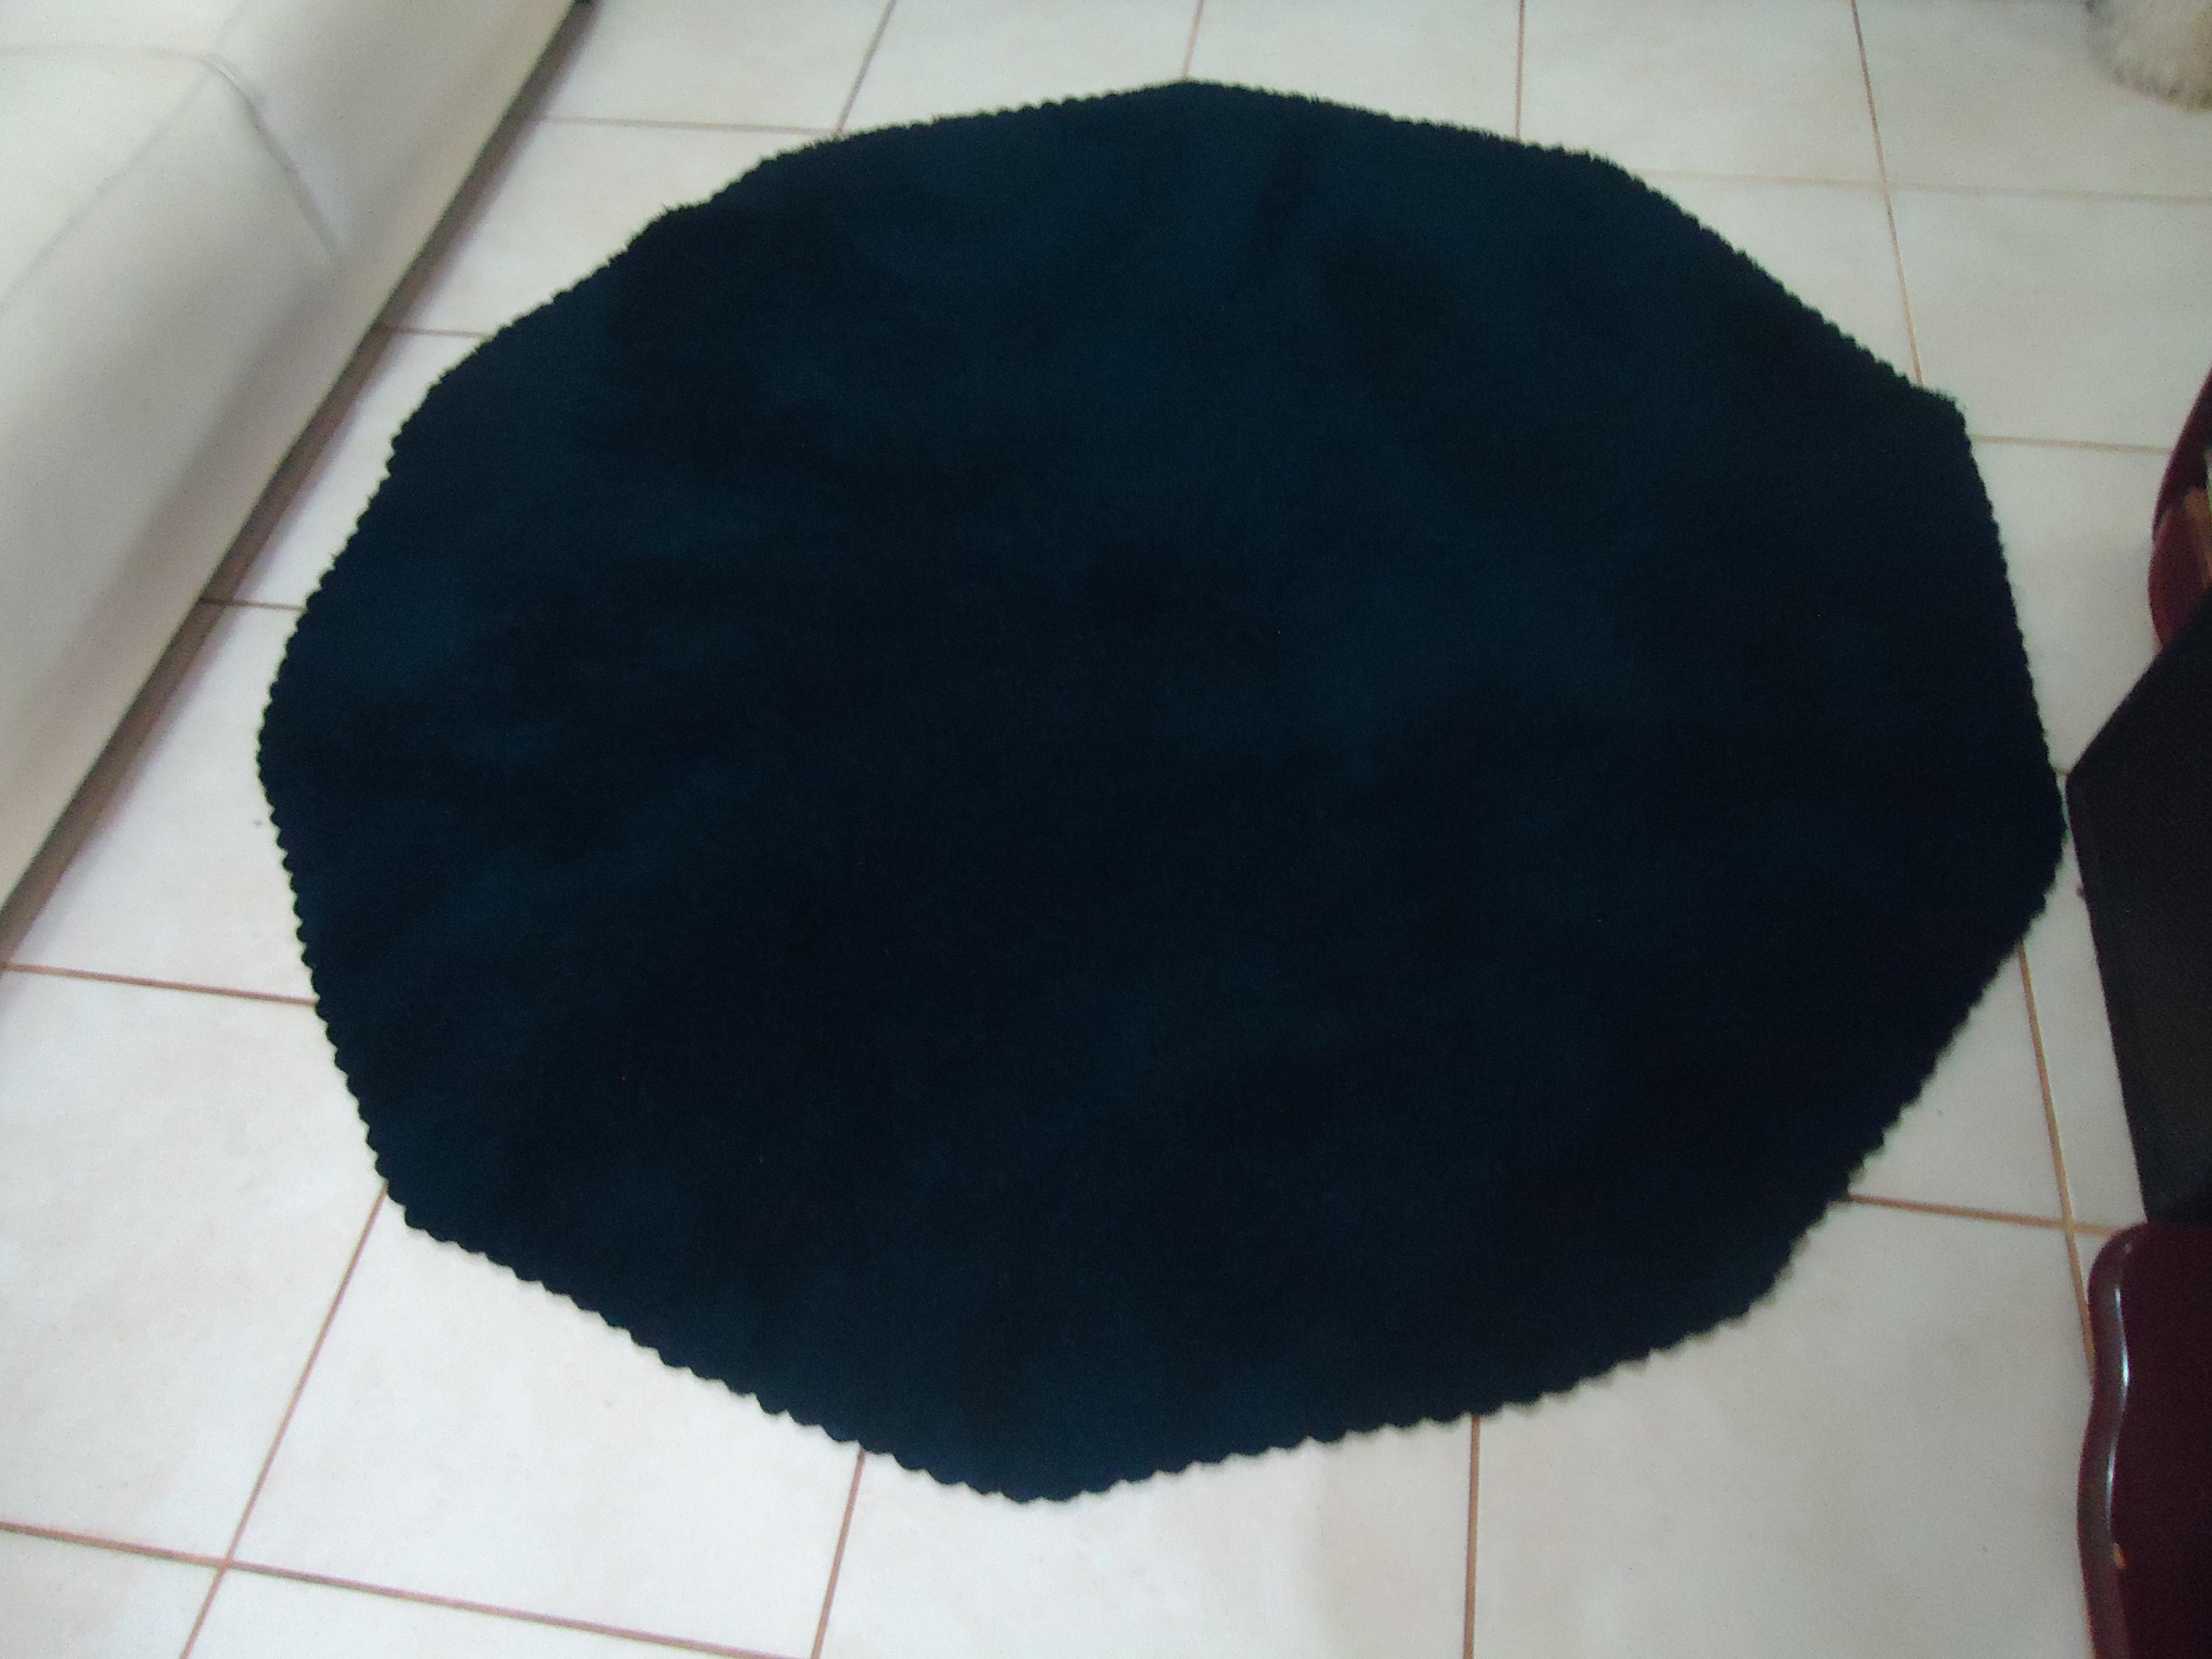 tapete azul marinho peludinho tapete #0A161F 4320 3240